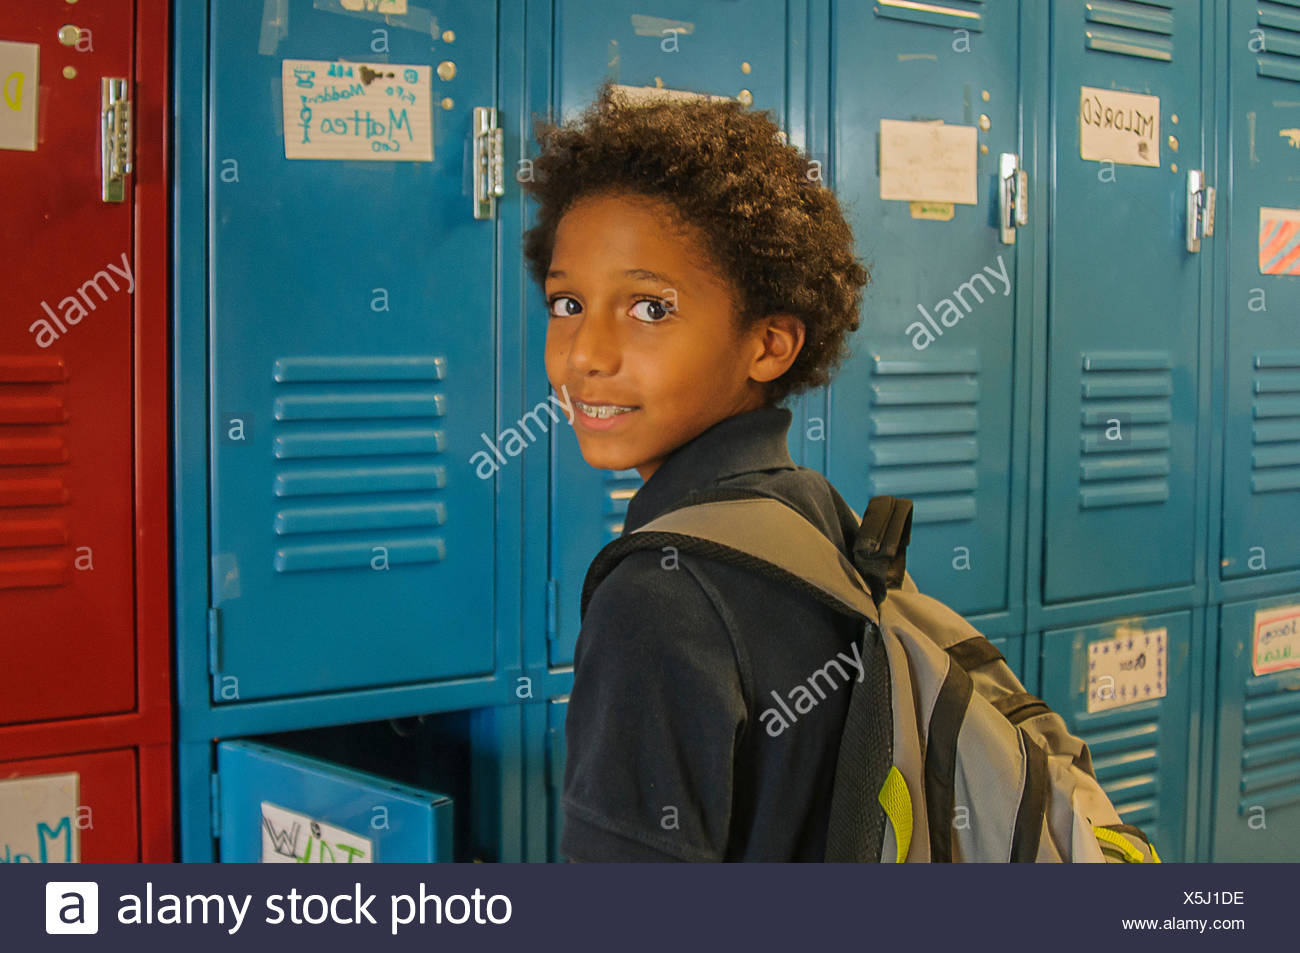 Retrato de colegiala apertura casillero escolar Imagen De Stock